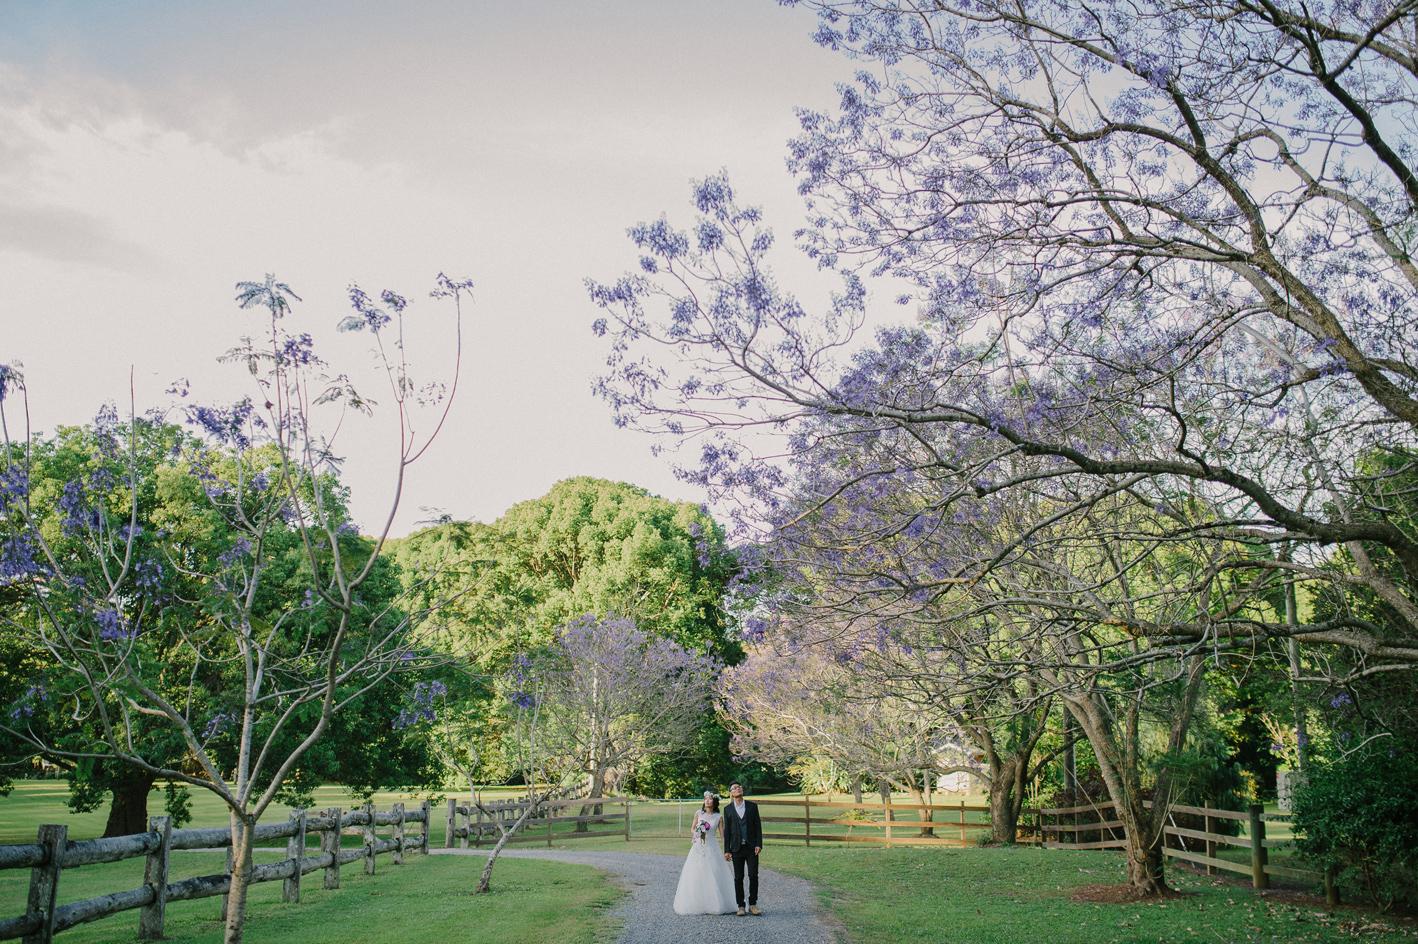 006-ed-janet-currumbin-wedding_sophie-baker-photography